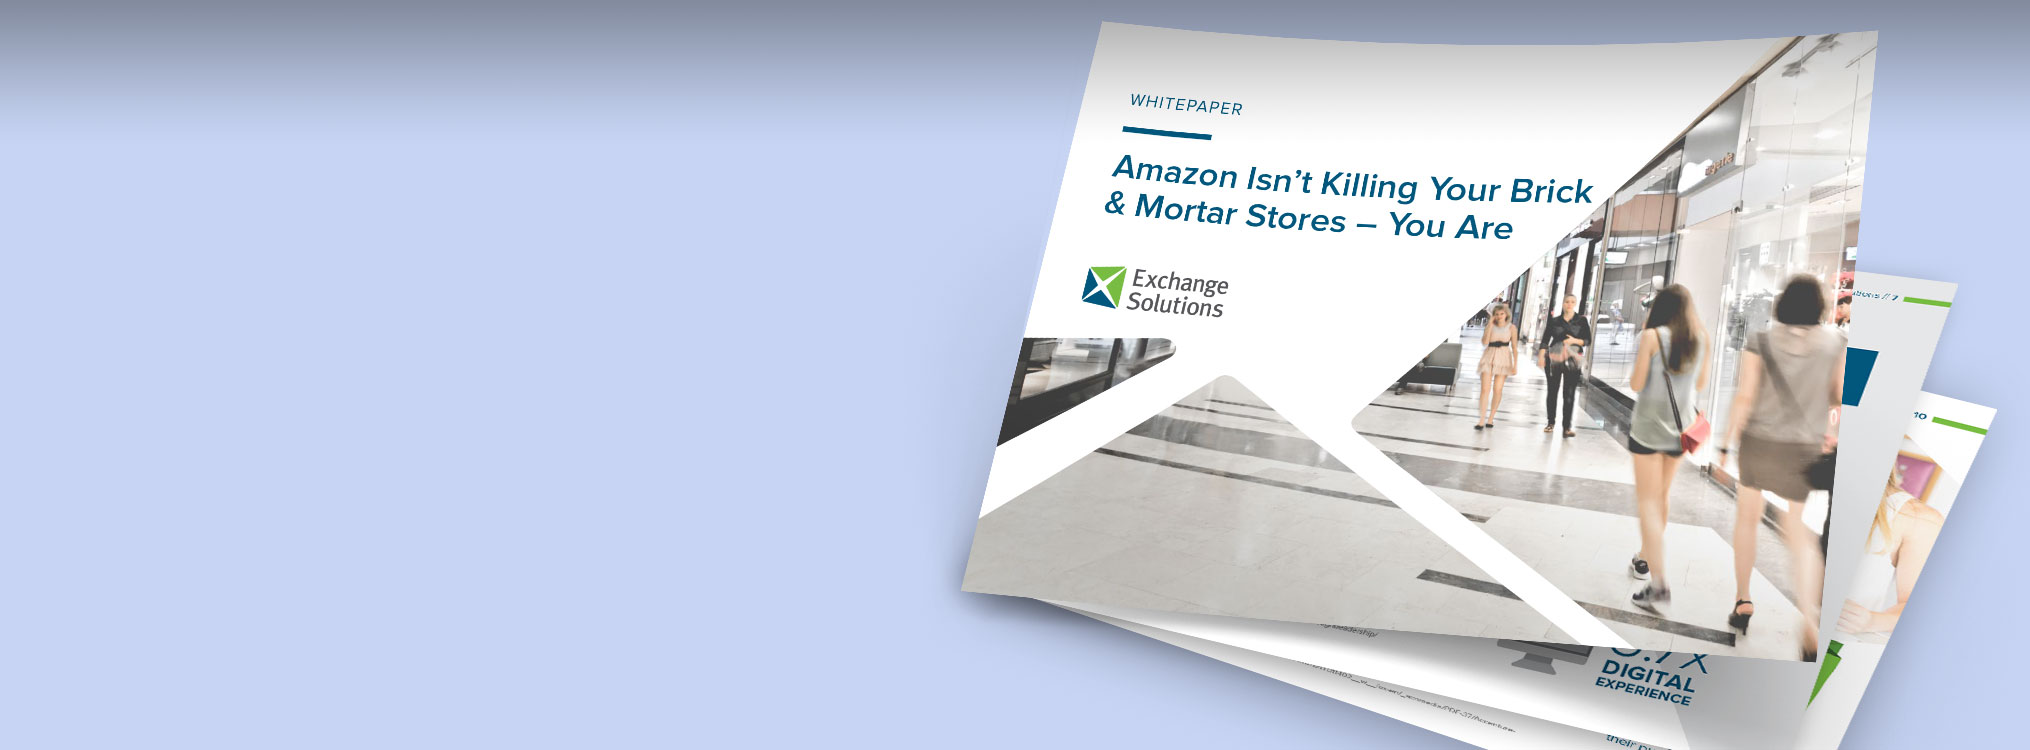 Whitepaper Retail Brick and mortar stores Amazon